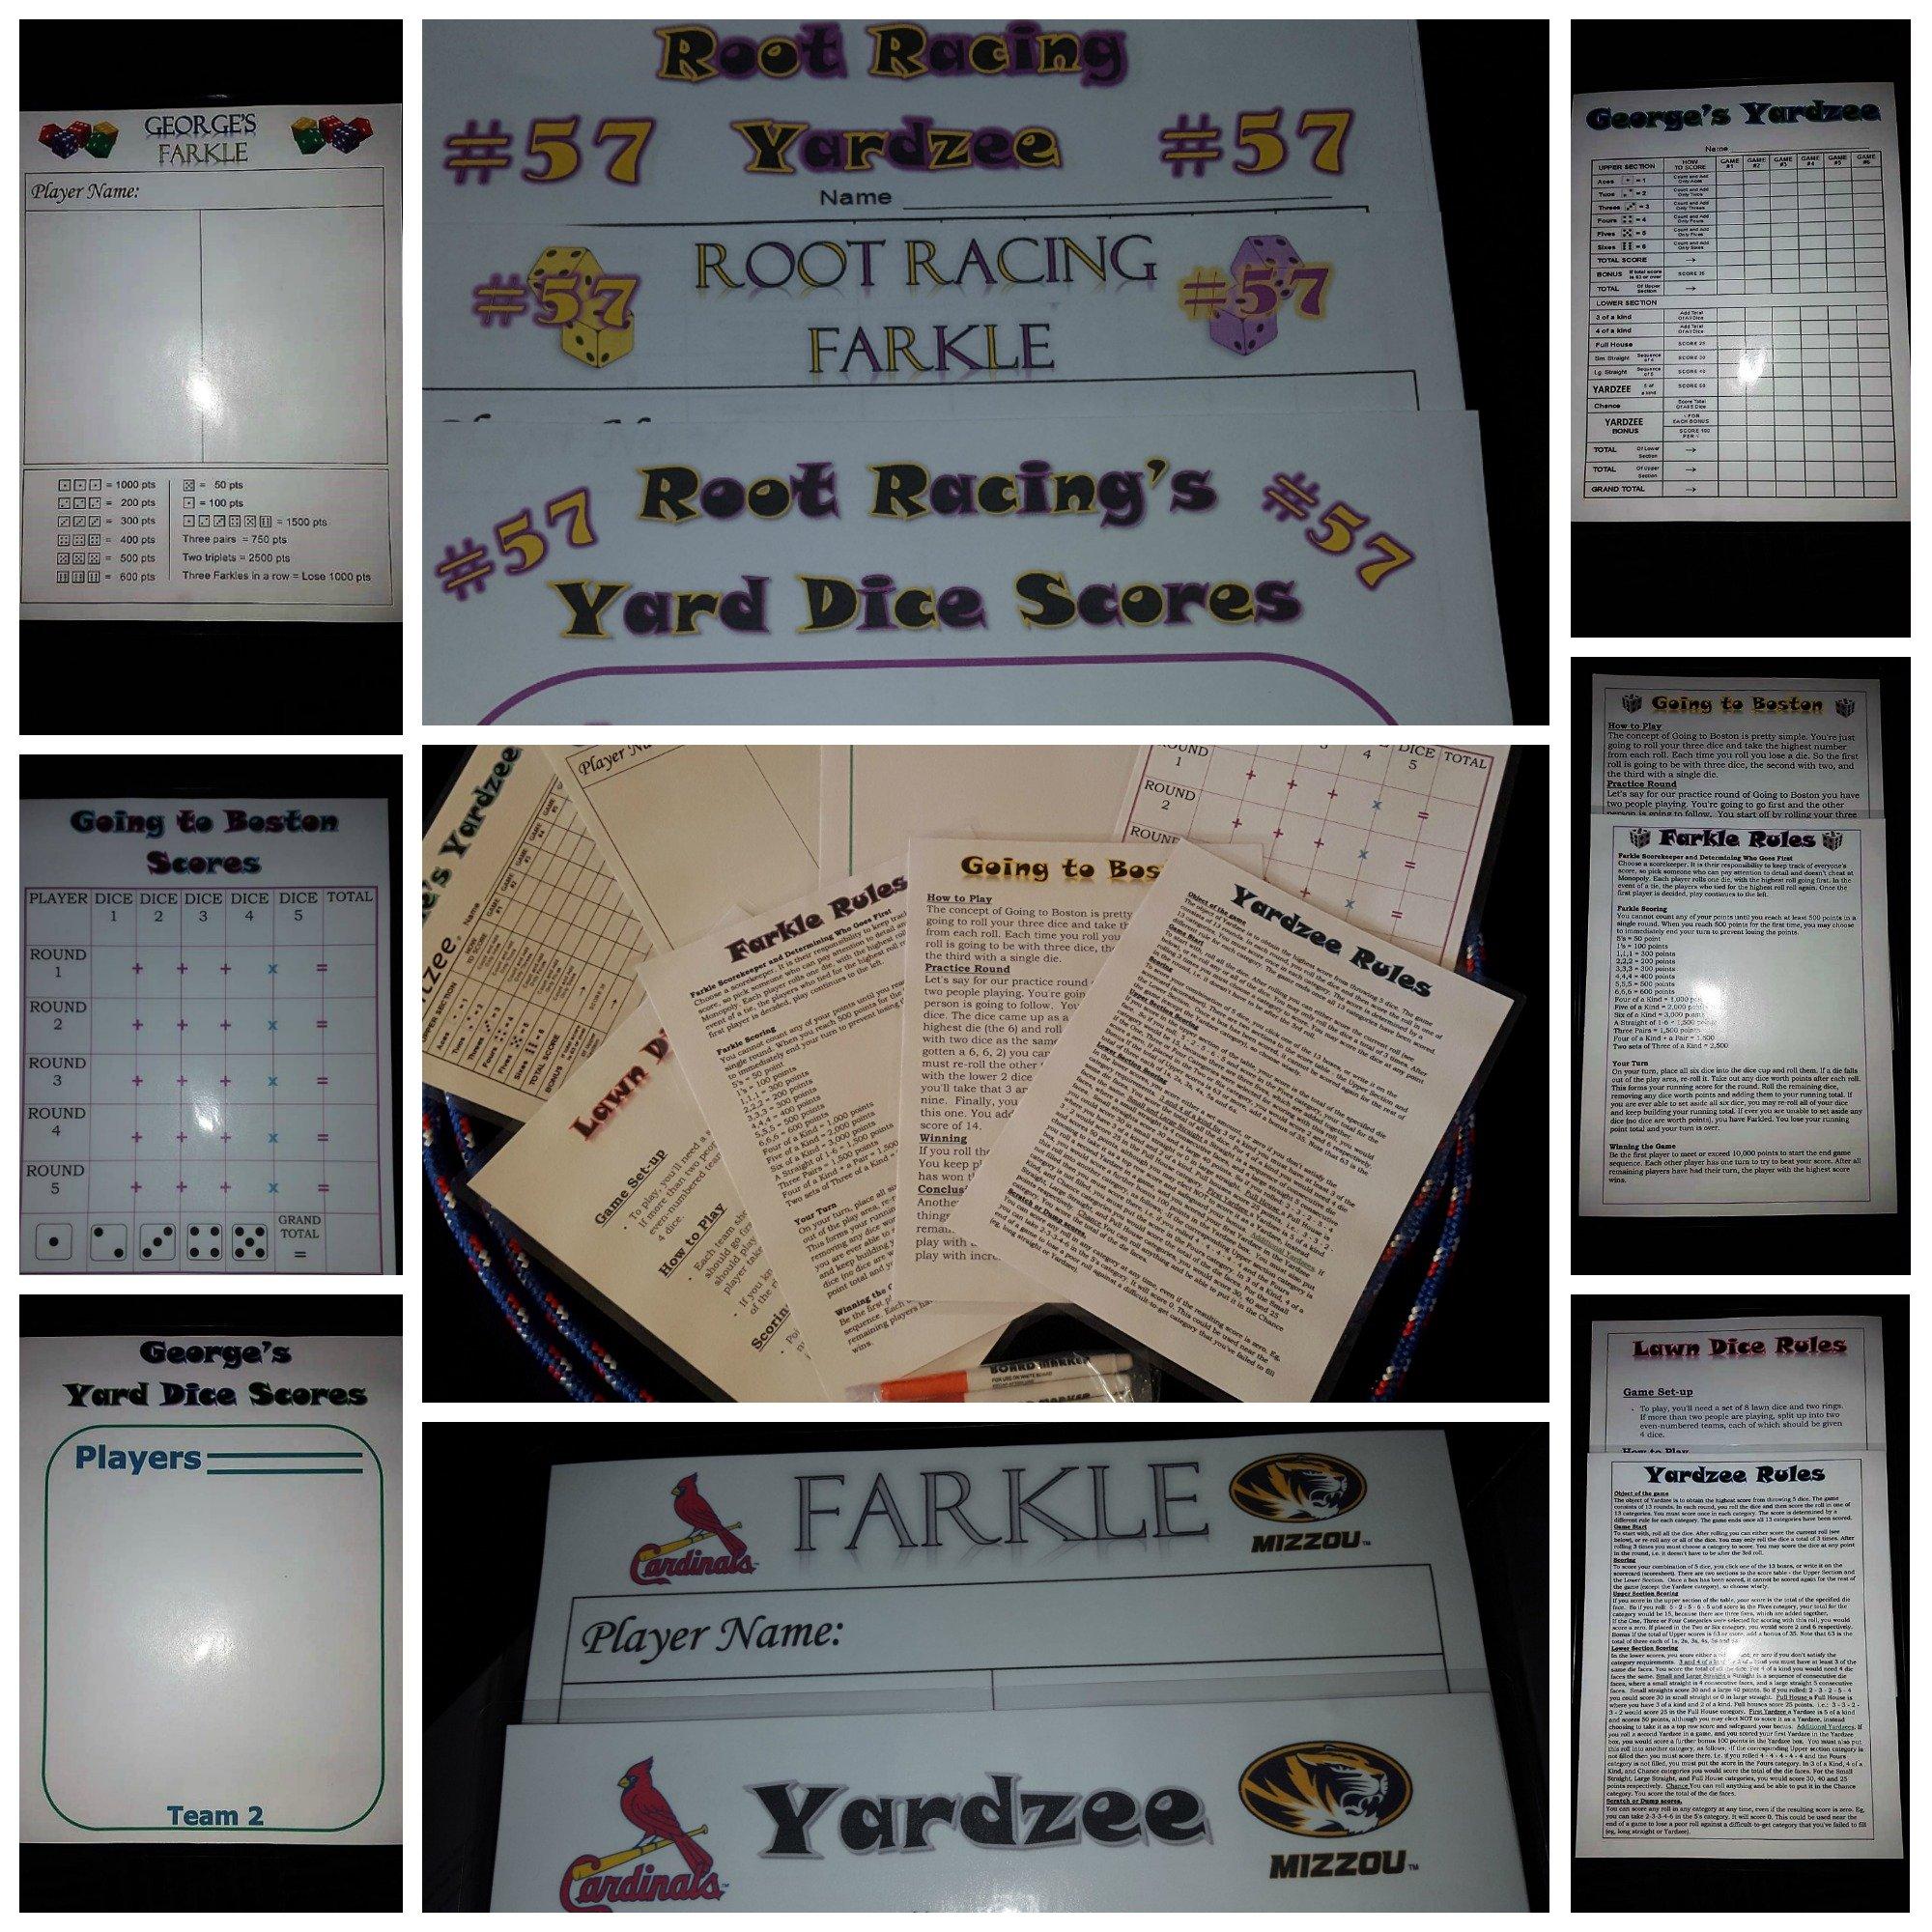 Deluxe Lawn dice, Yardzee, Farkle Hand made 3 1/2 dice Set of 8 dice